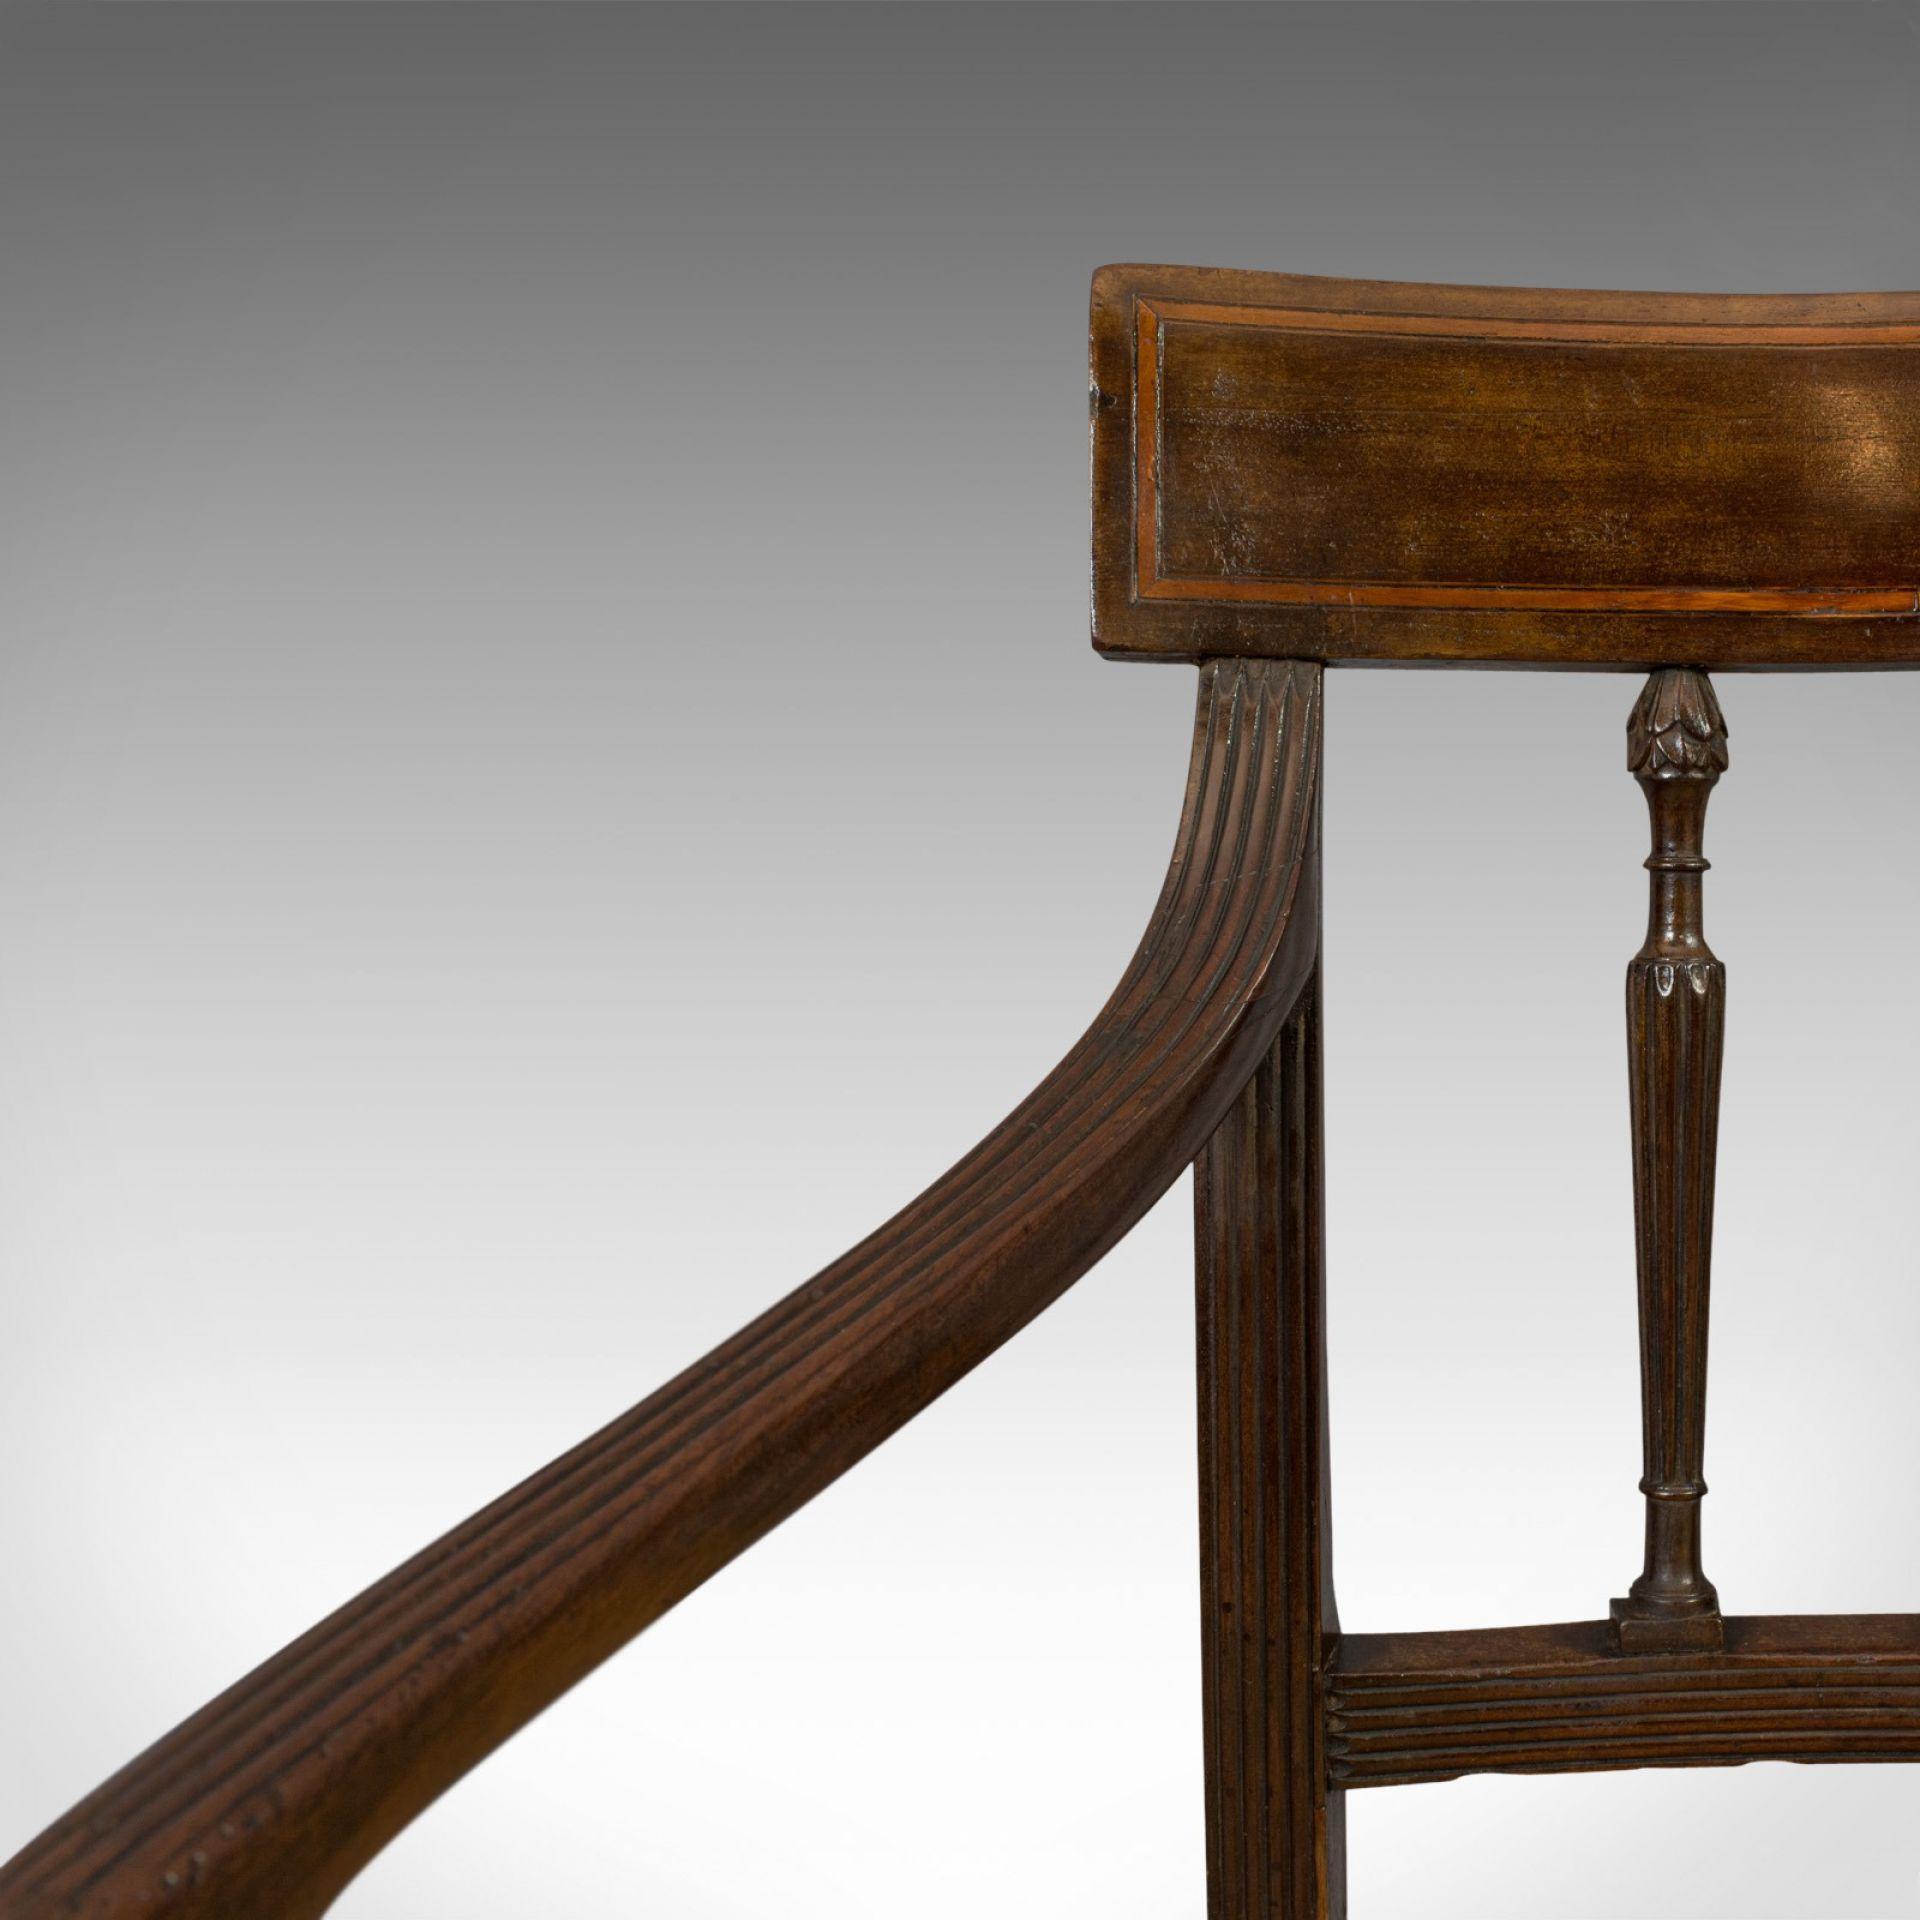 Antique Elbow chair, English, Mahogany, Armchair, Sheraton Overtones, Regency